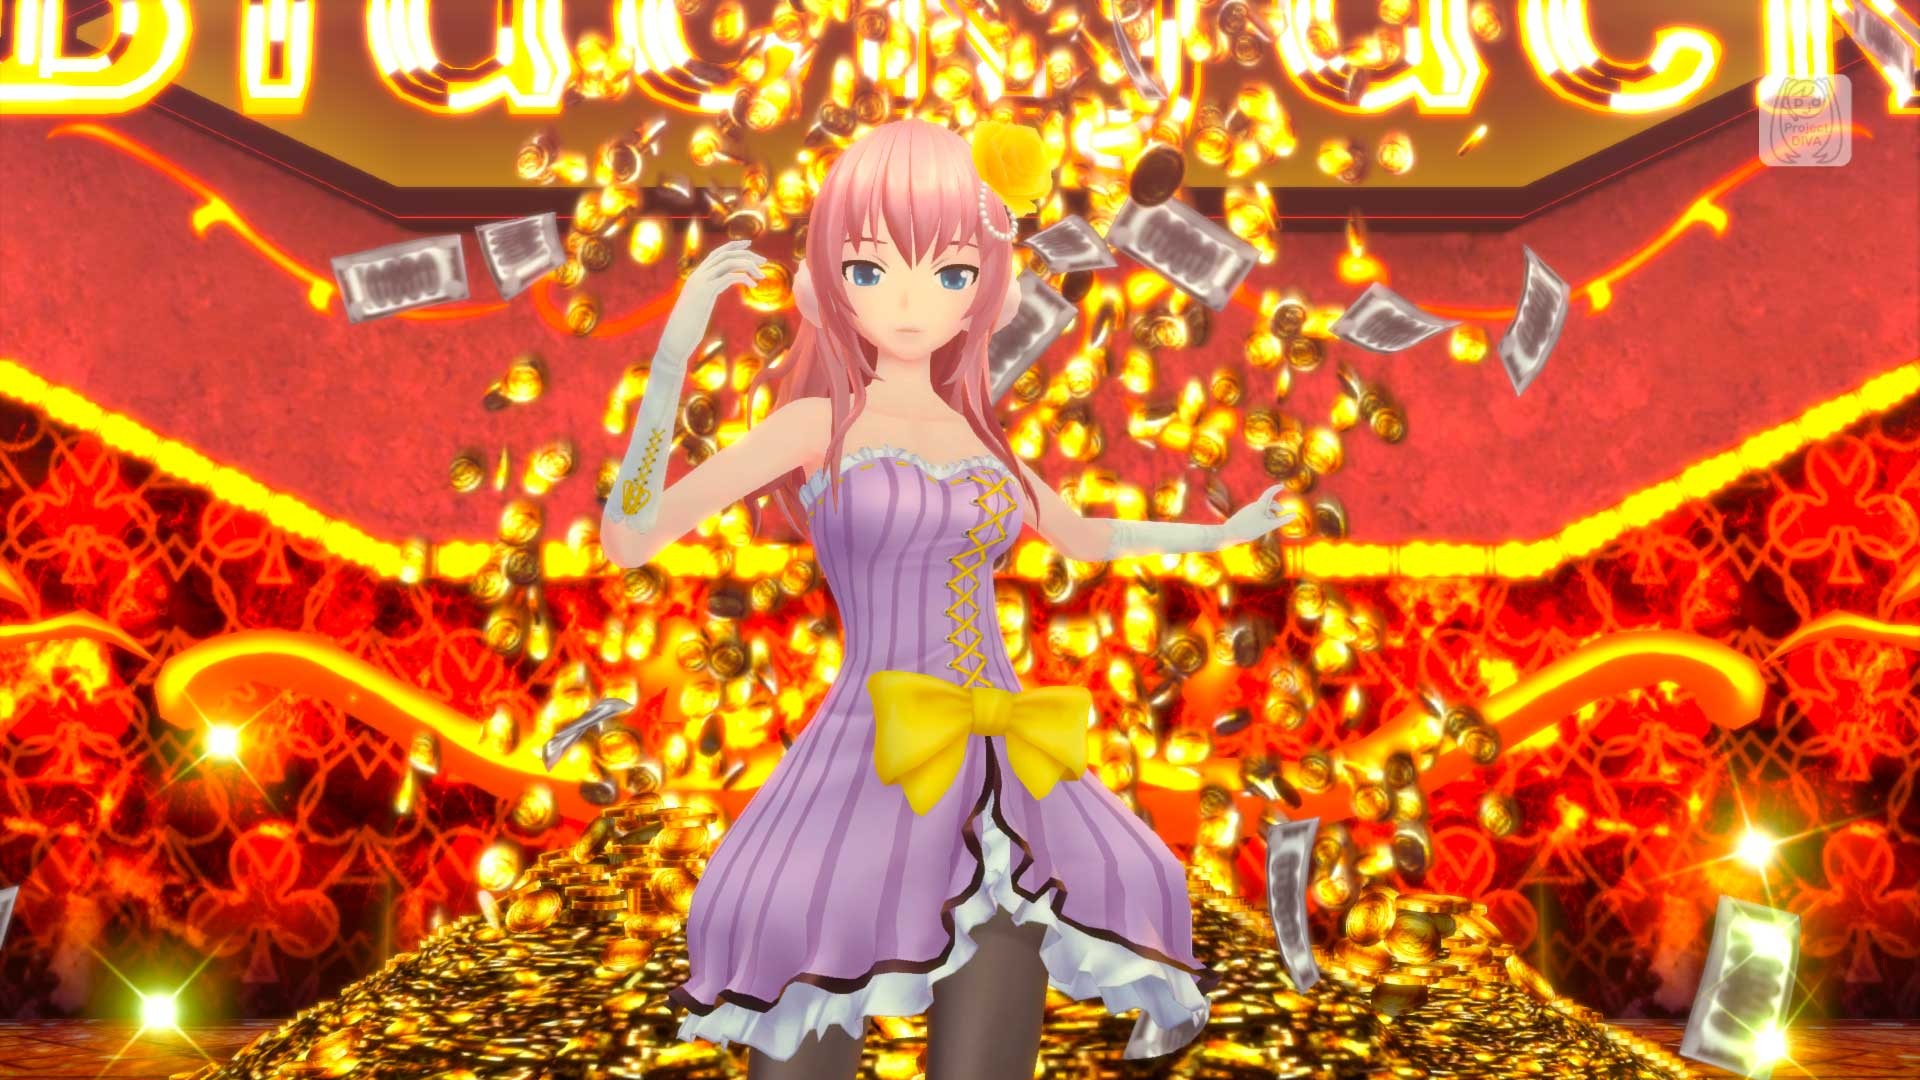 HatsuneMikuDIVAF2nd_Addon_fairymacaron_PS3_SS3_1425409228